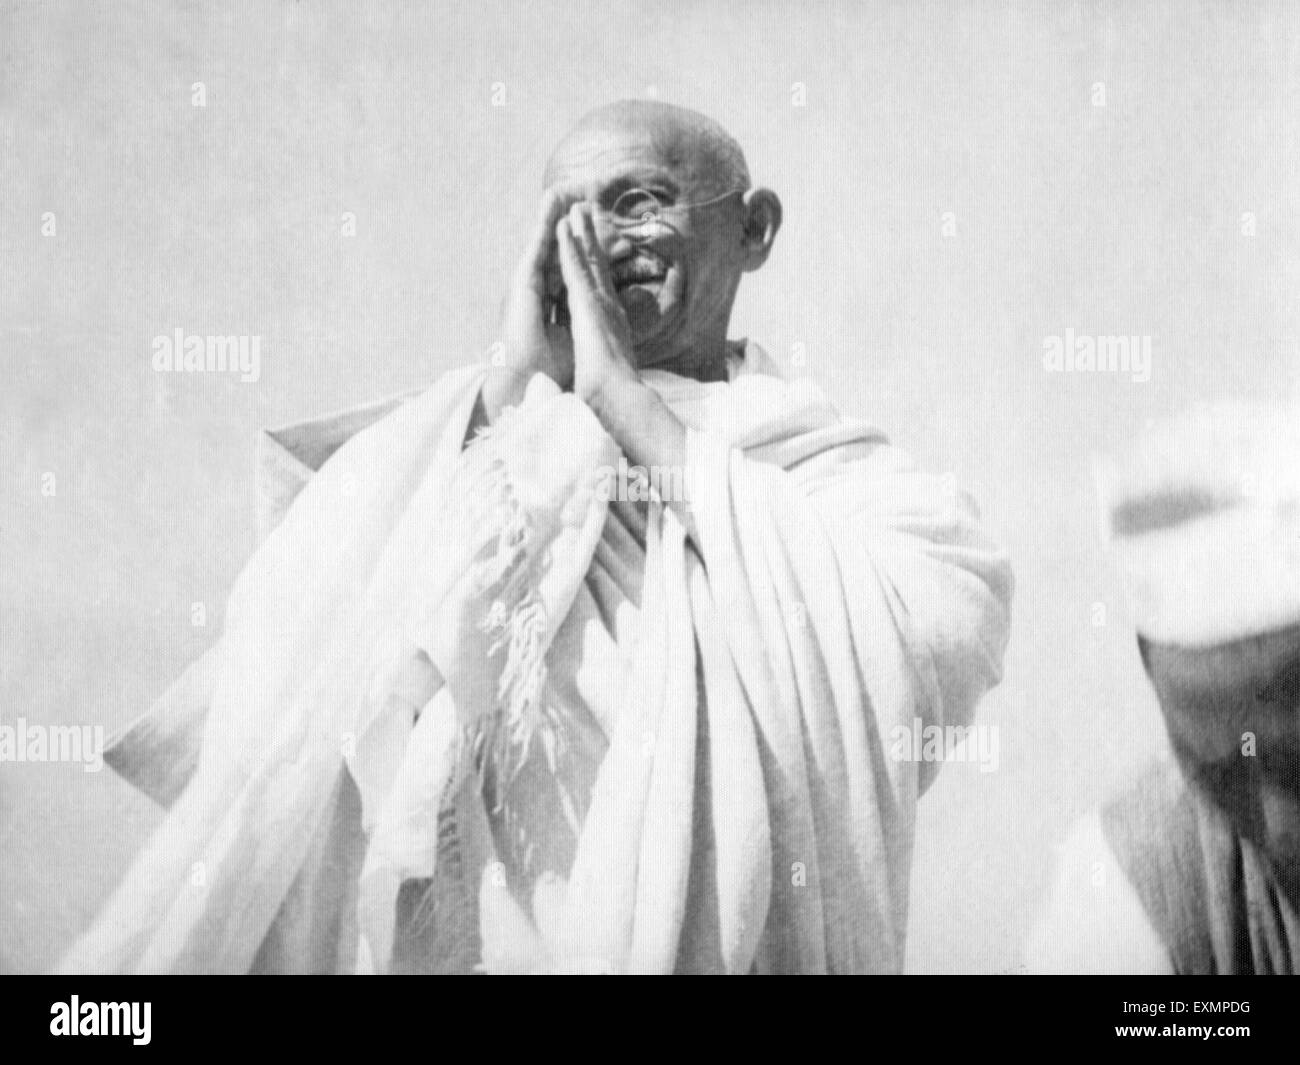 Mahatma Gandhi in greeting pose in Madras ; 1946 ; India - mkg 146300 - Stock Image